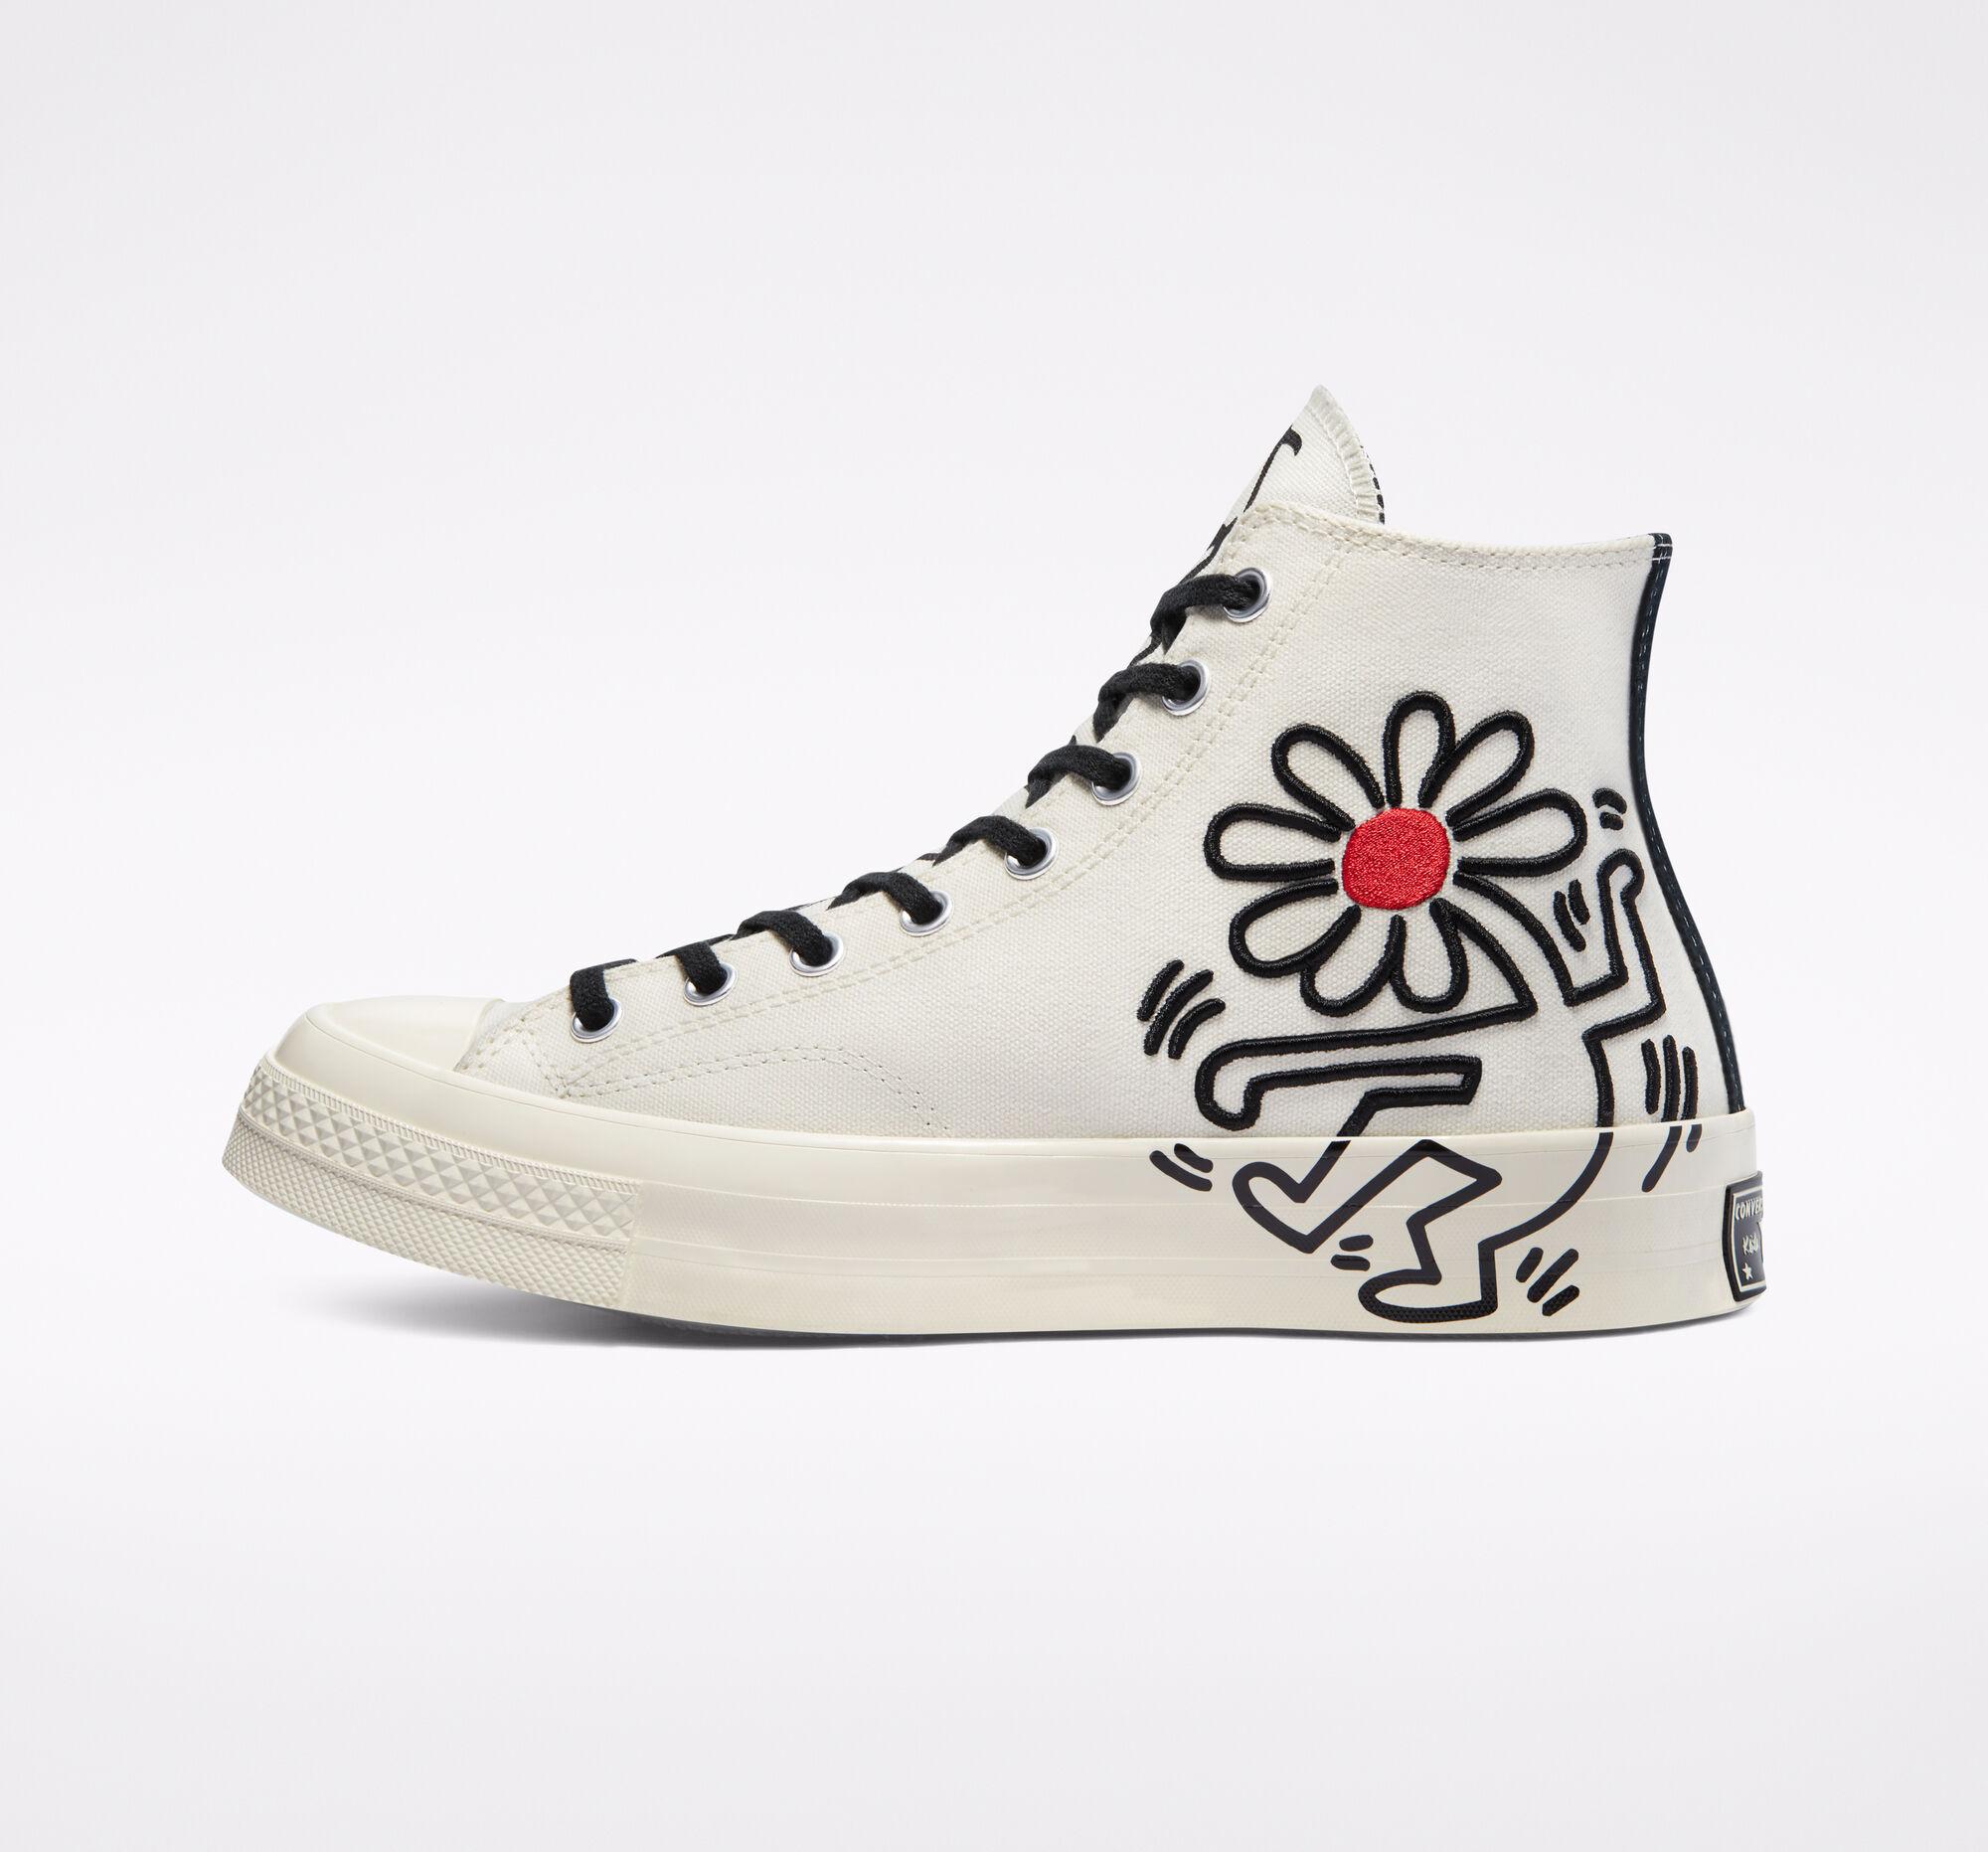 Keith Haring x Converse Chuck 70 High